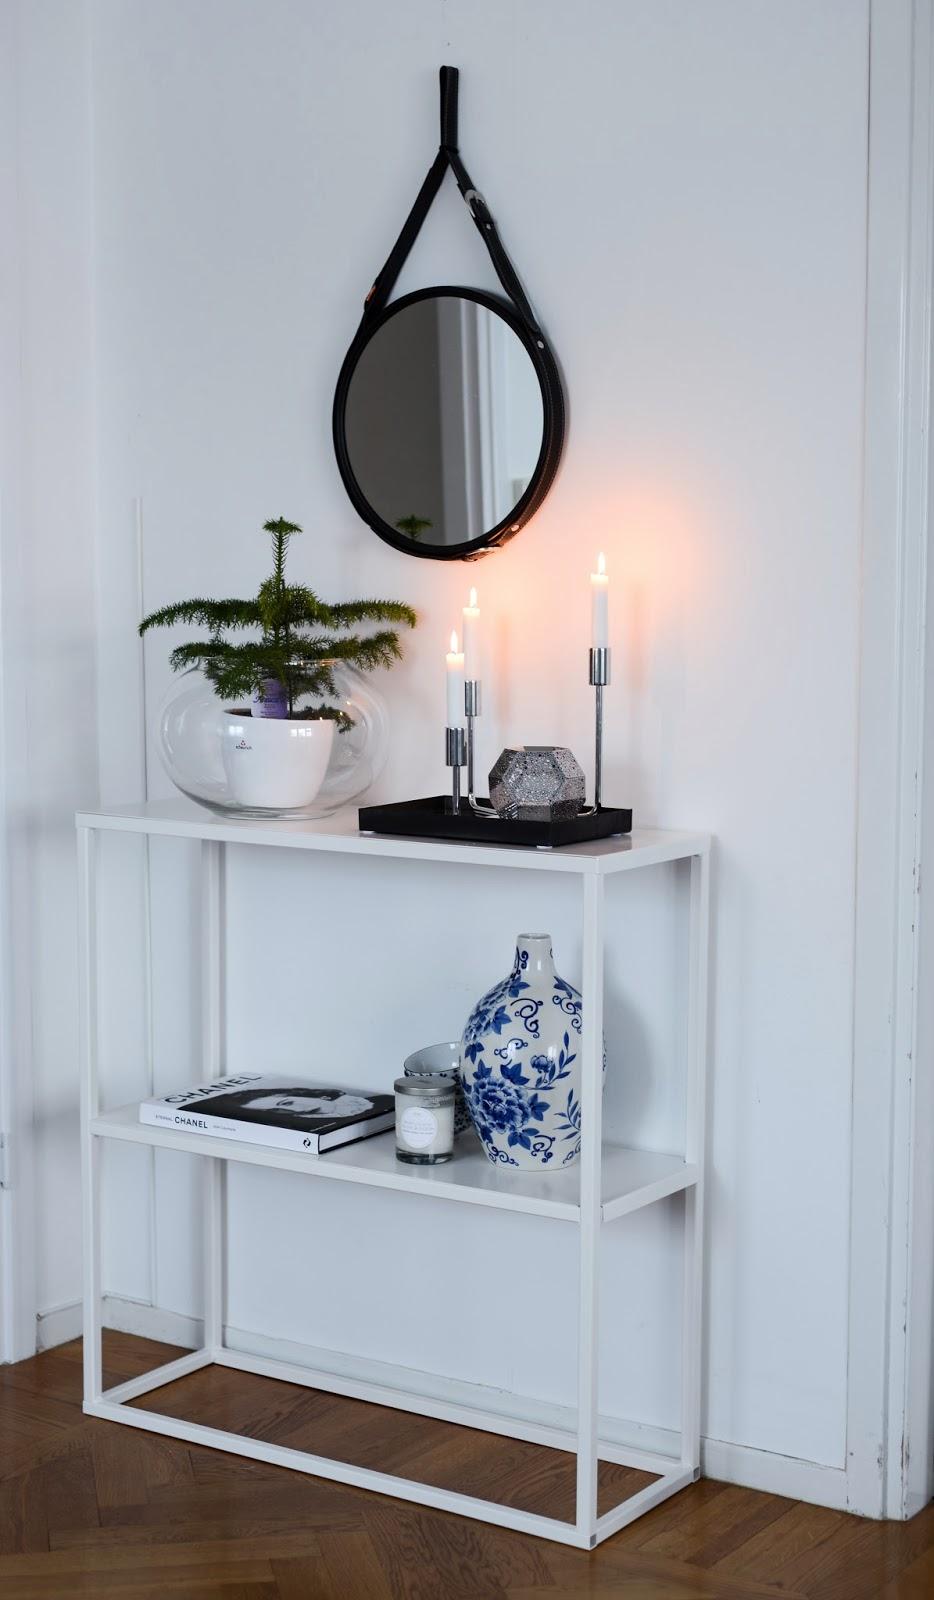 house of mandy the perfect m bel vill du g ra en. Black Bedroom Furniture Sets. Home Design Ideas